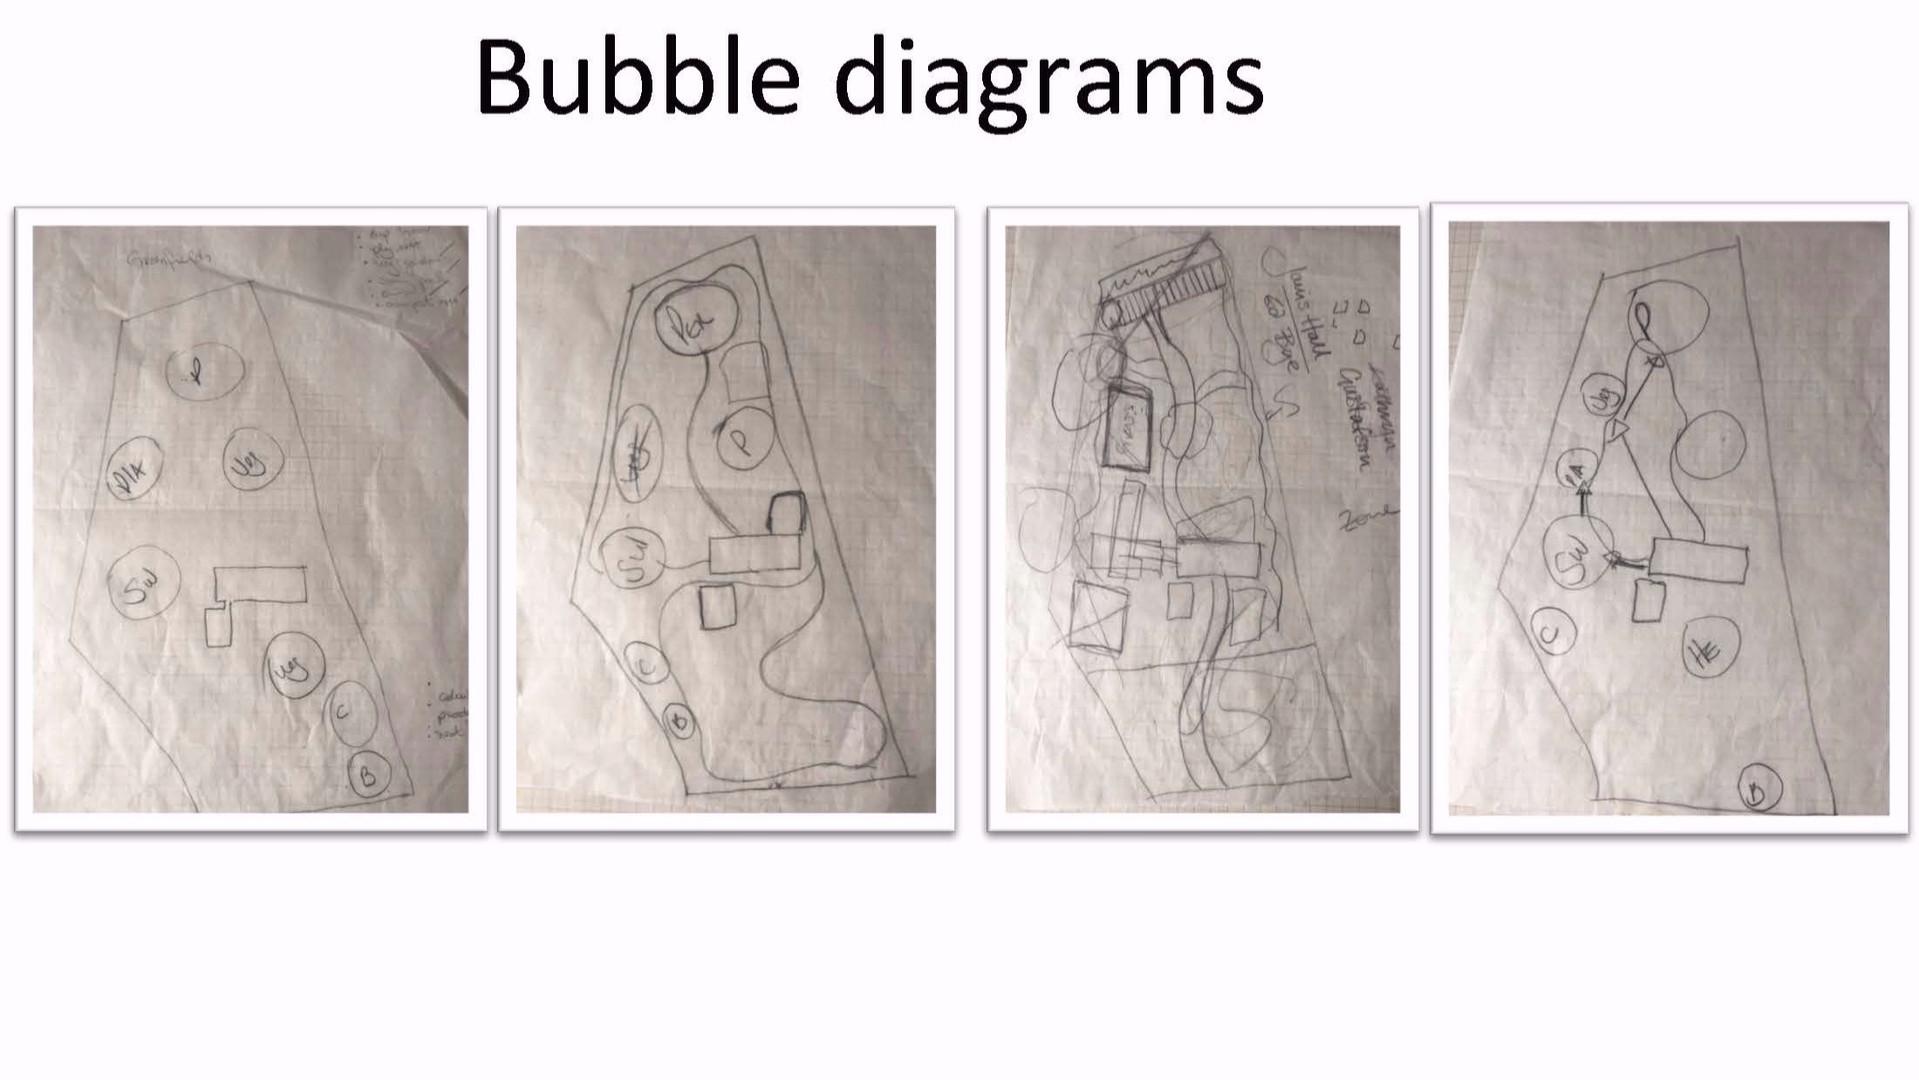 Private property - Chilterns - Bubble Diagrams